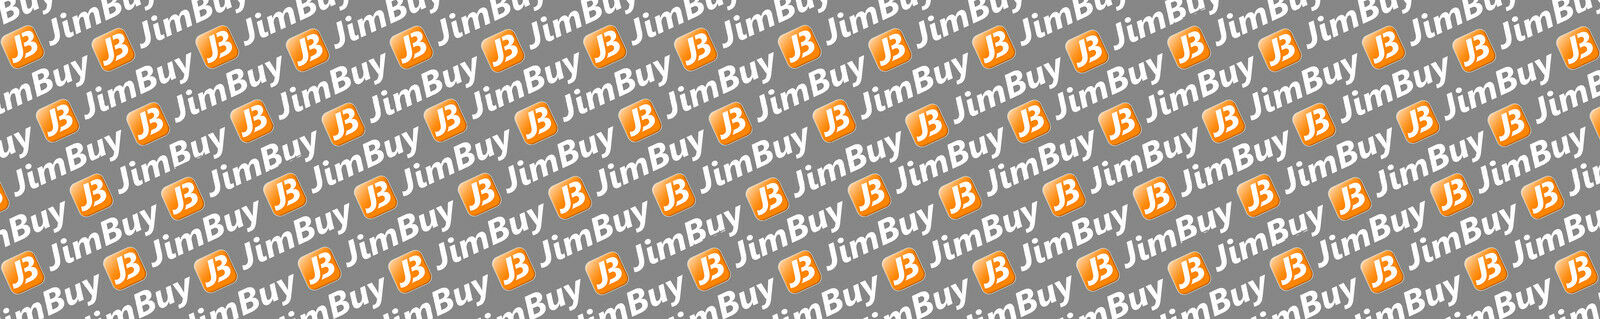 Jimbuy-Shop